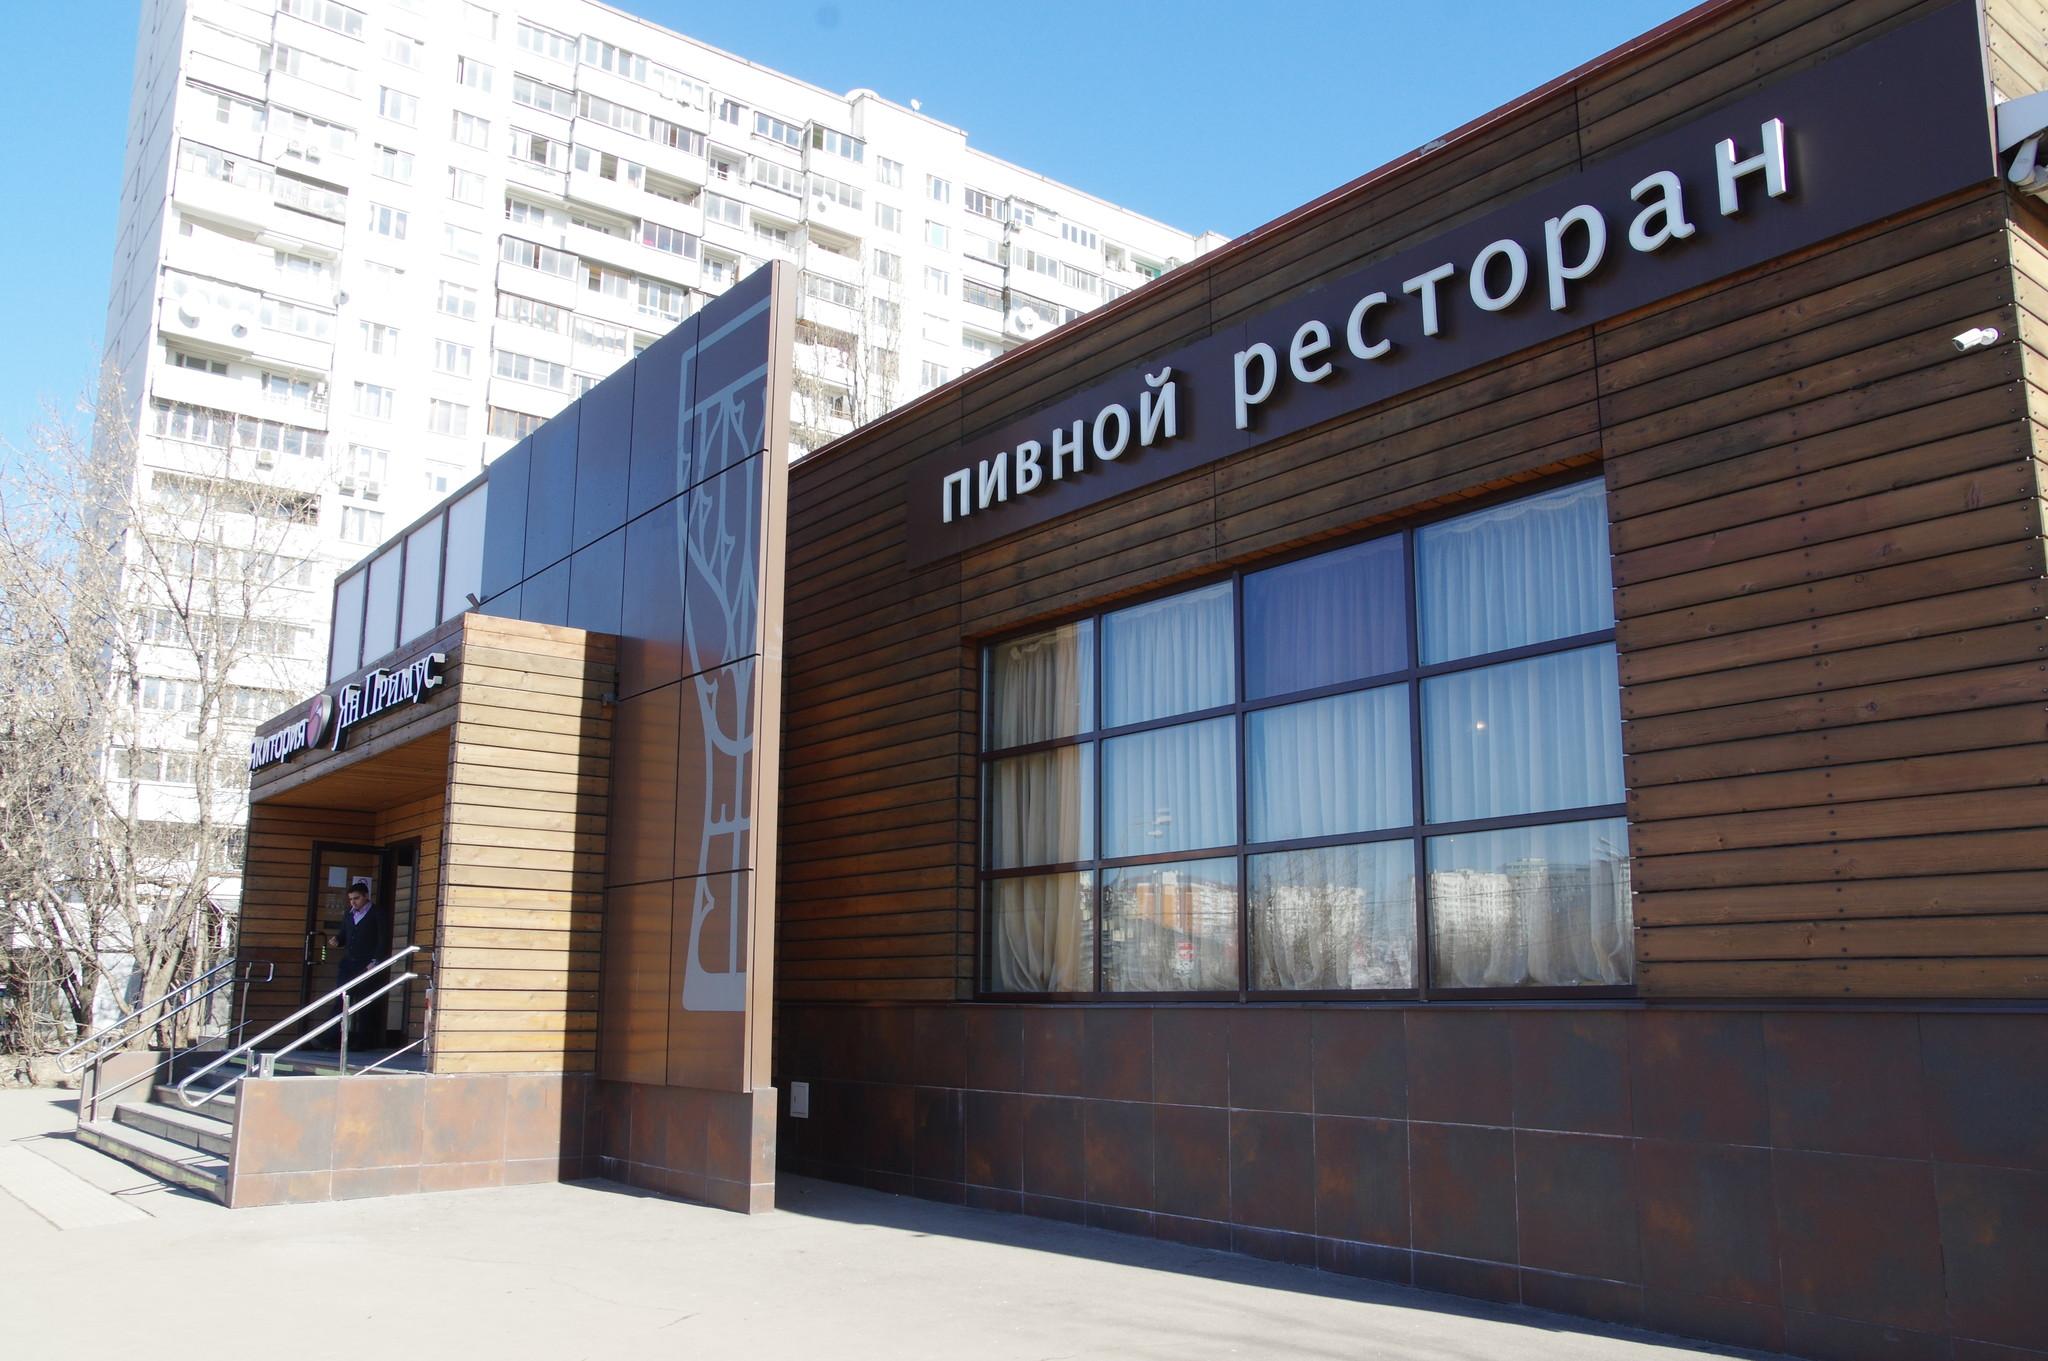 Ресторан «Ян Примус» (Вернадского проспект, дом 76А)